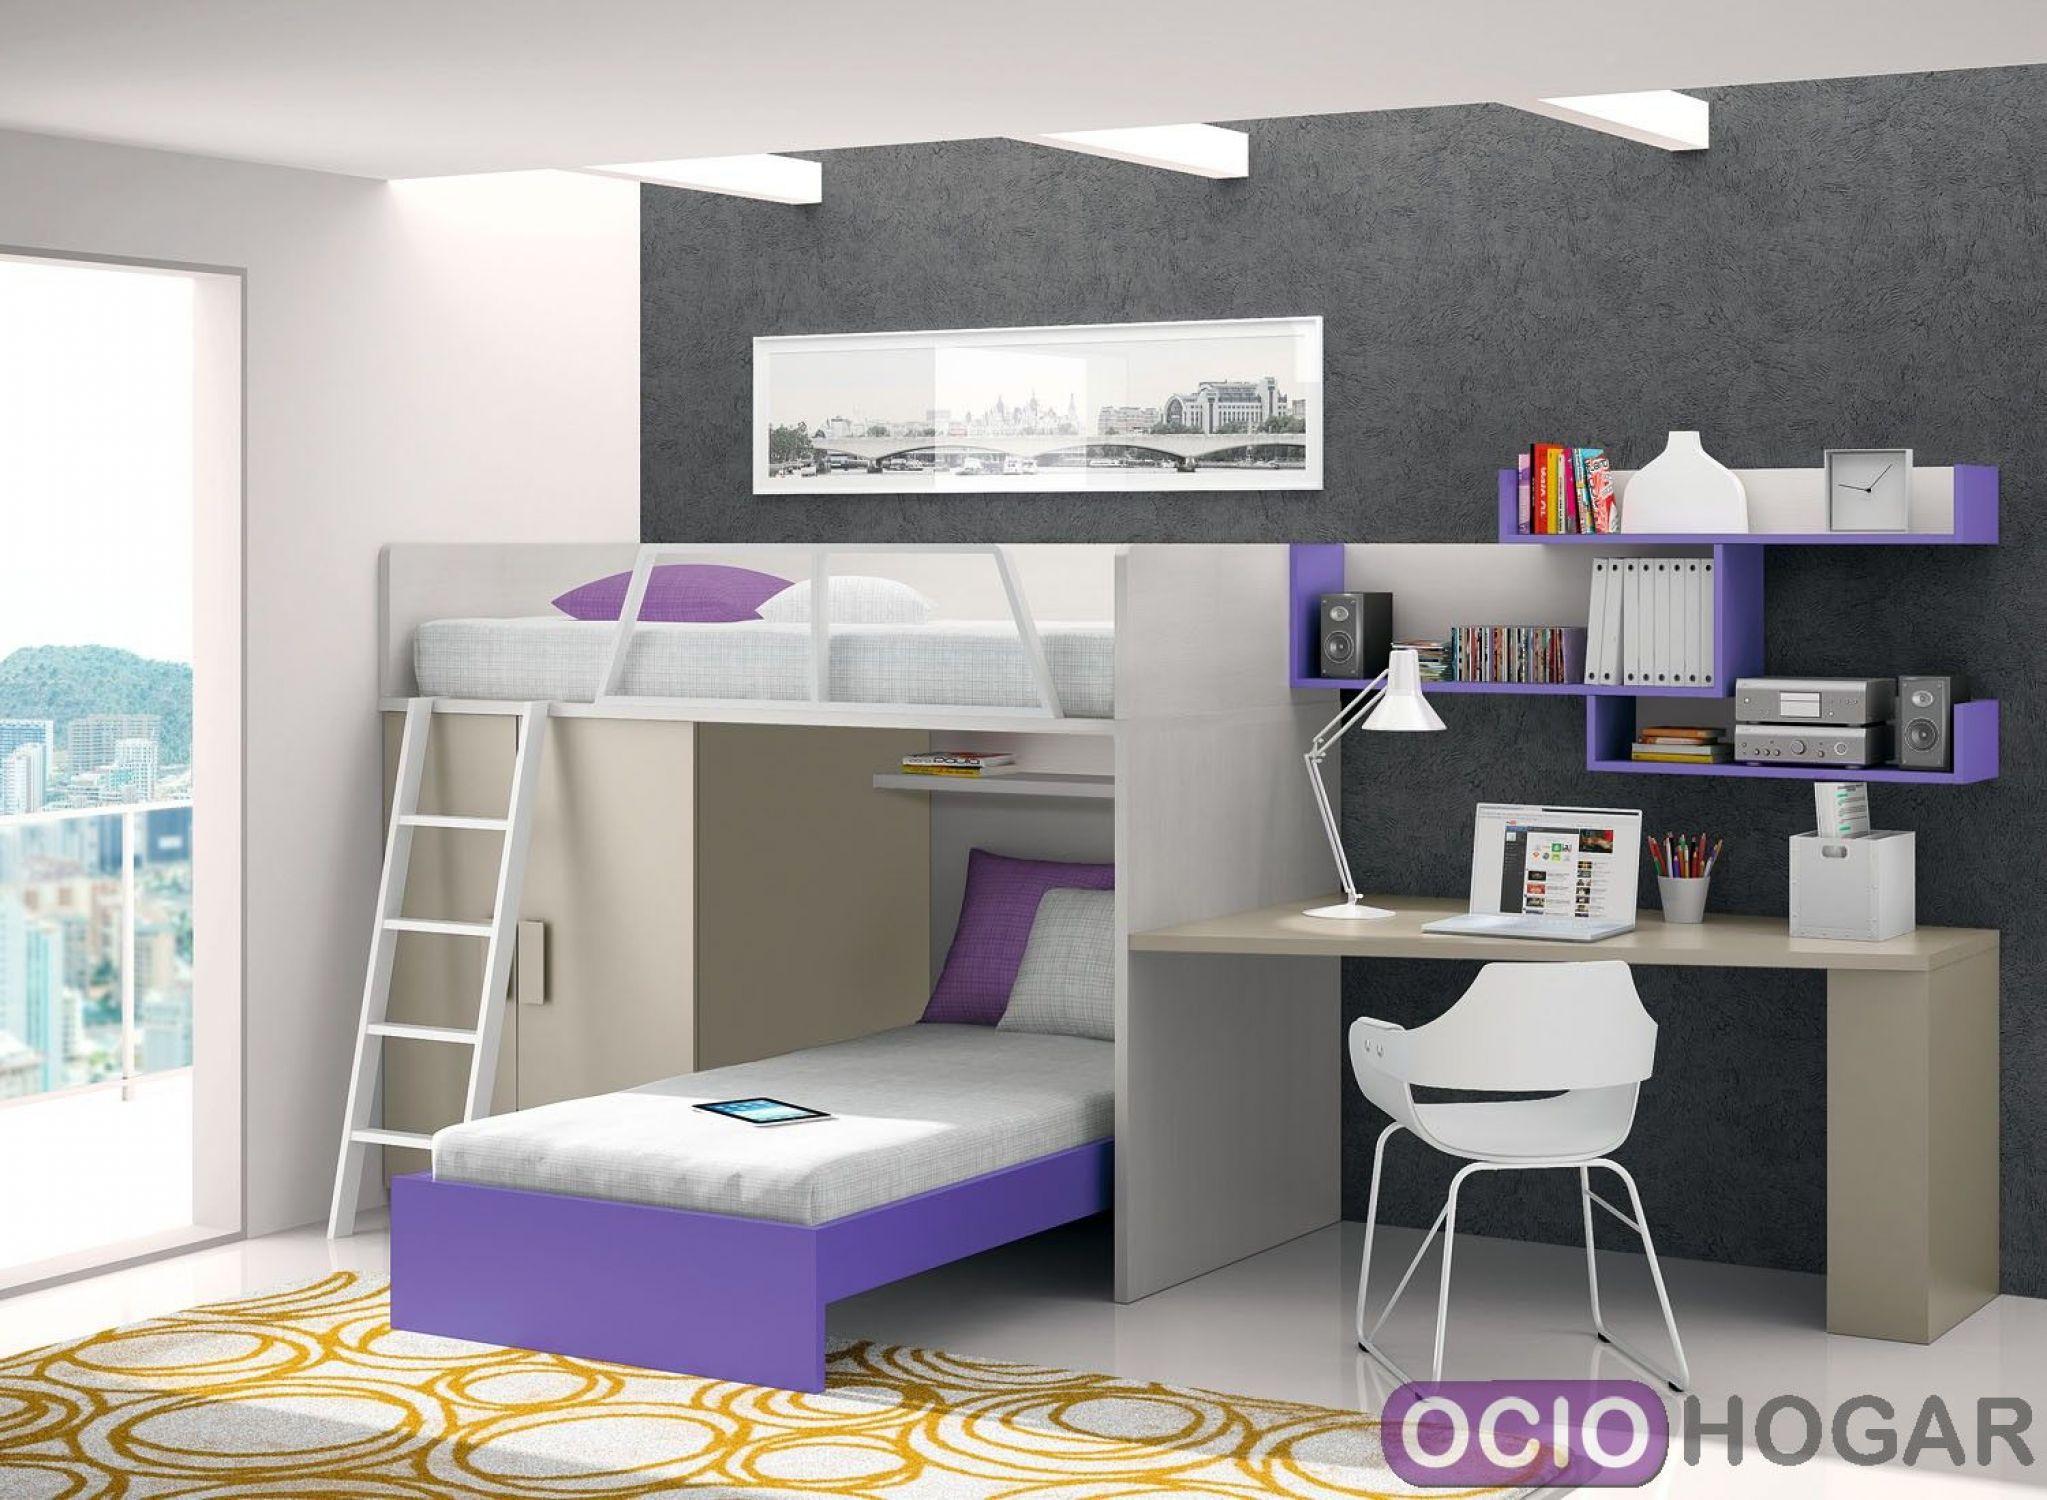 Dormitorio juvenil violet de dissery muebles infantiles - Habitacion juvenil doble ...